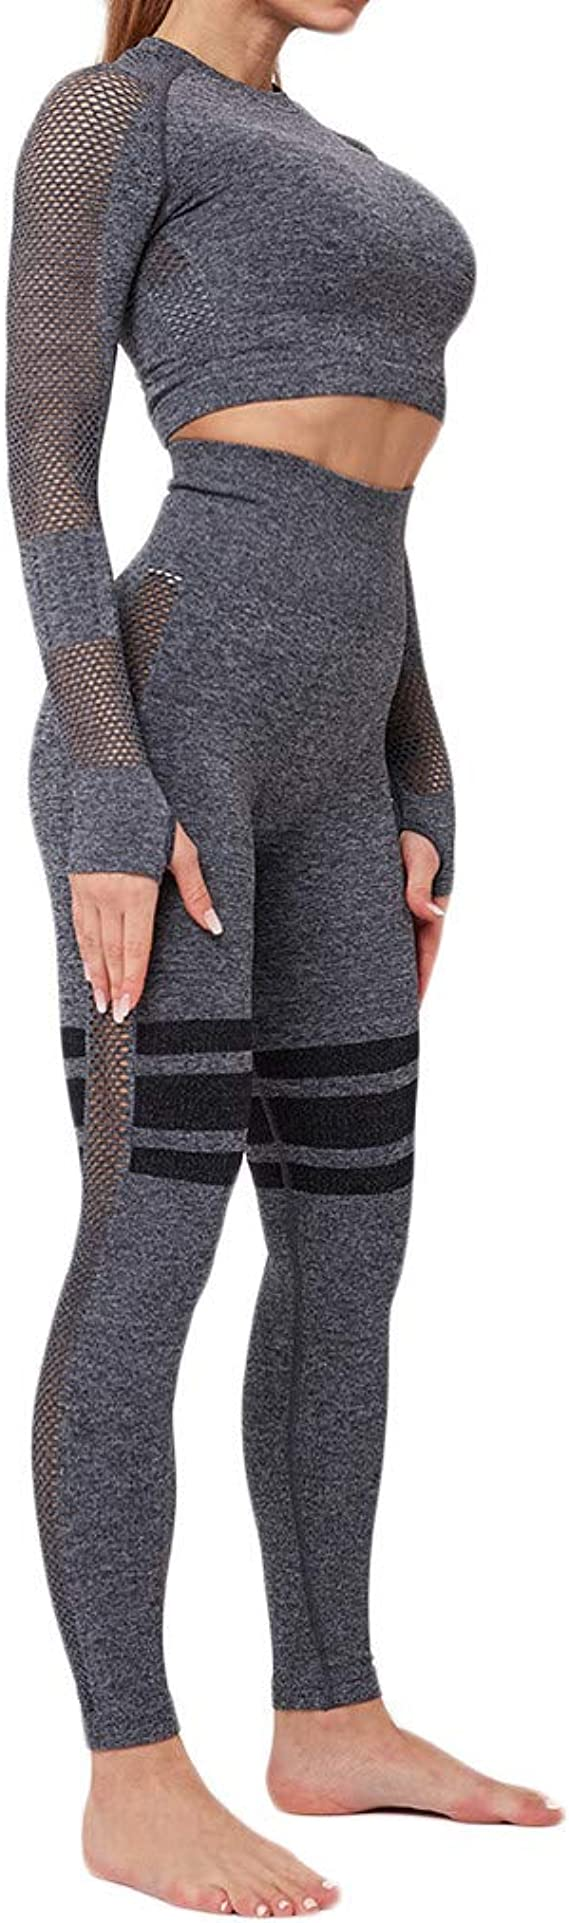 Trainingsanzug Damen Kapuzenpullover Bauchfrei Langarm Crop Top Hose Sportanzug